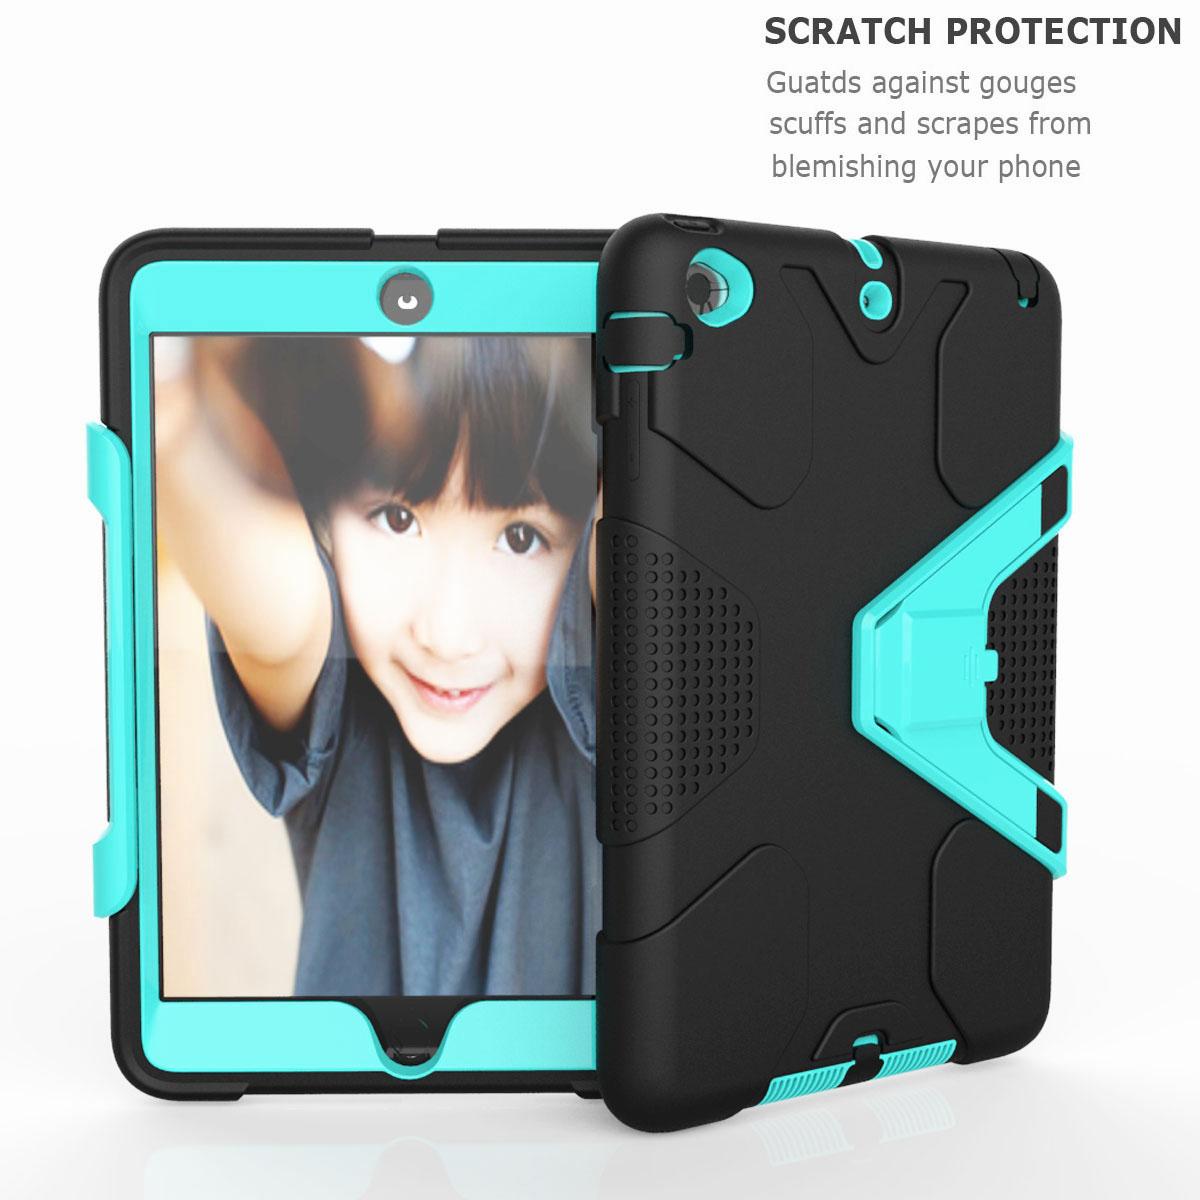 Luxury-Shockproof-Tough-Armor-with-Hard-Kickstand-Case-For-Apple-iPad-Mini-1-2-3 thumbnail 42